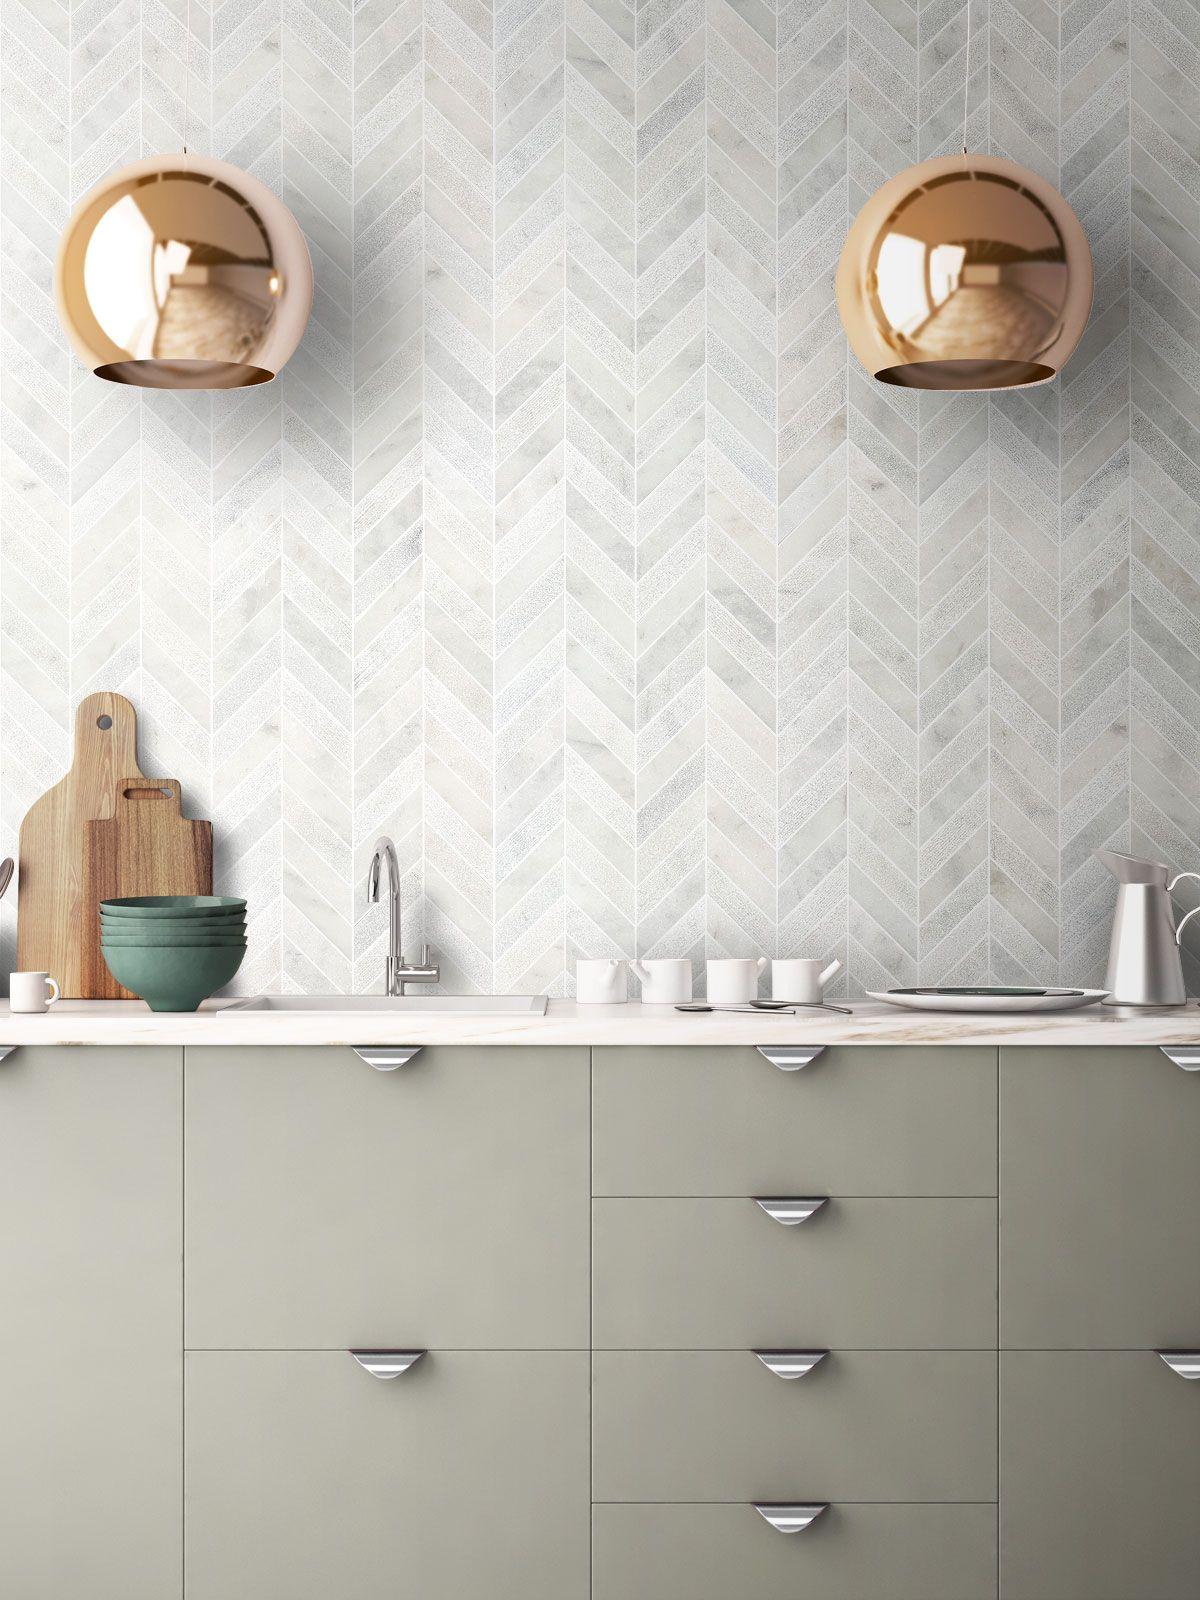 Ba631613 Marble Home Decor Tile Backsplash Kitchen Marble